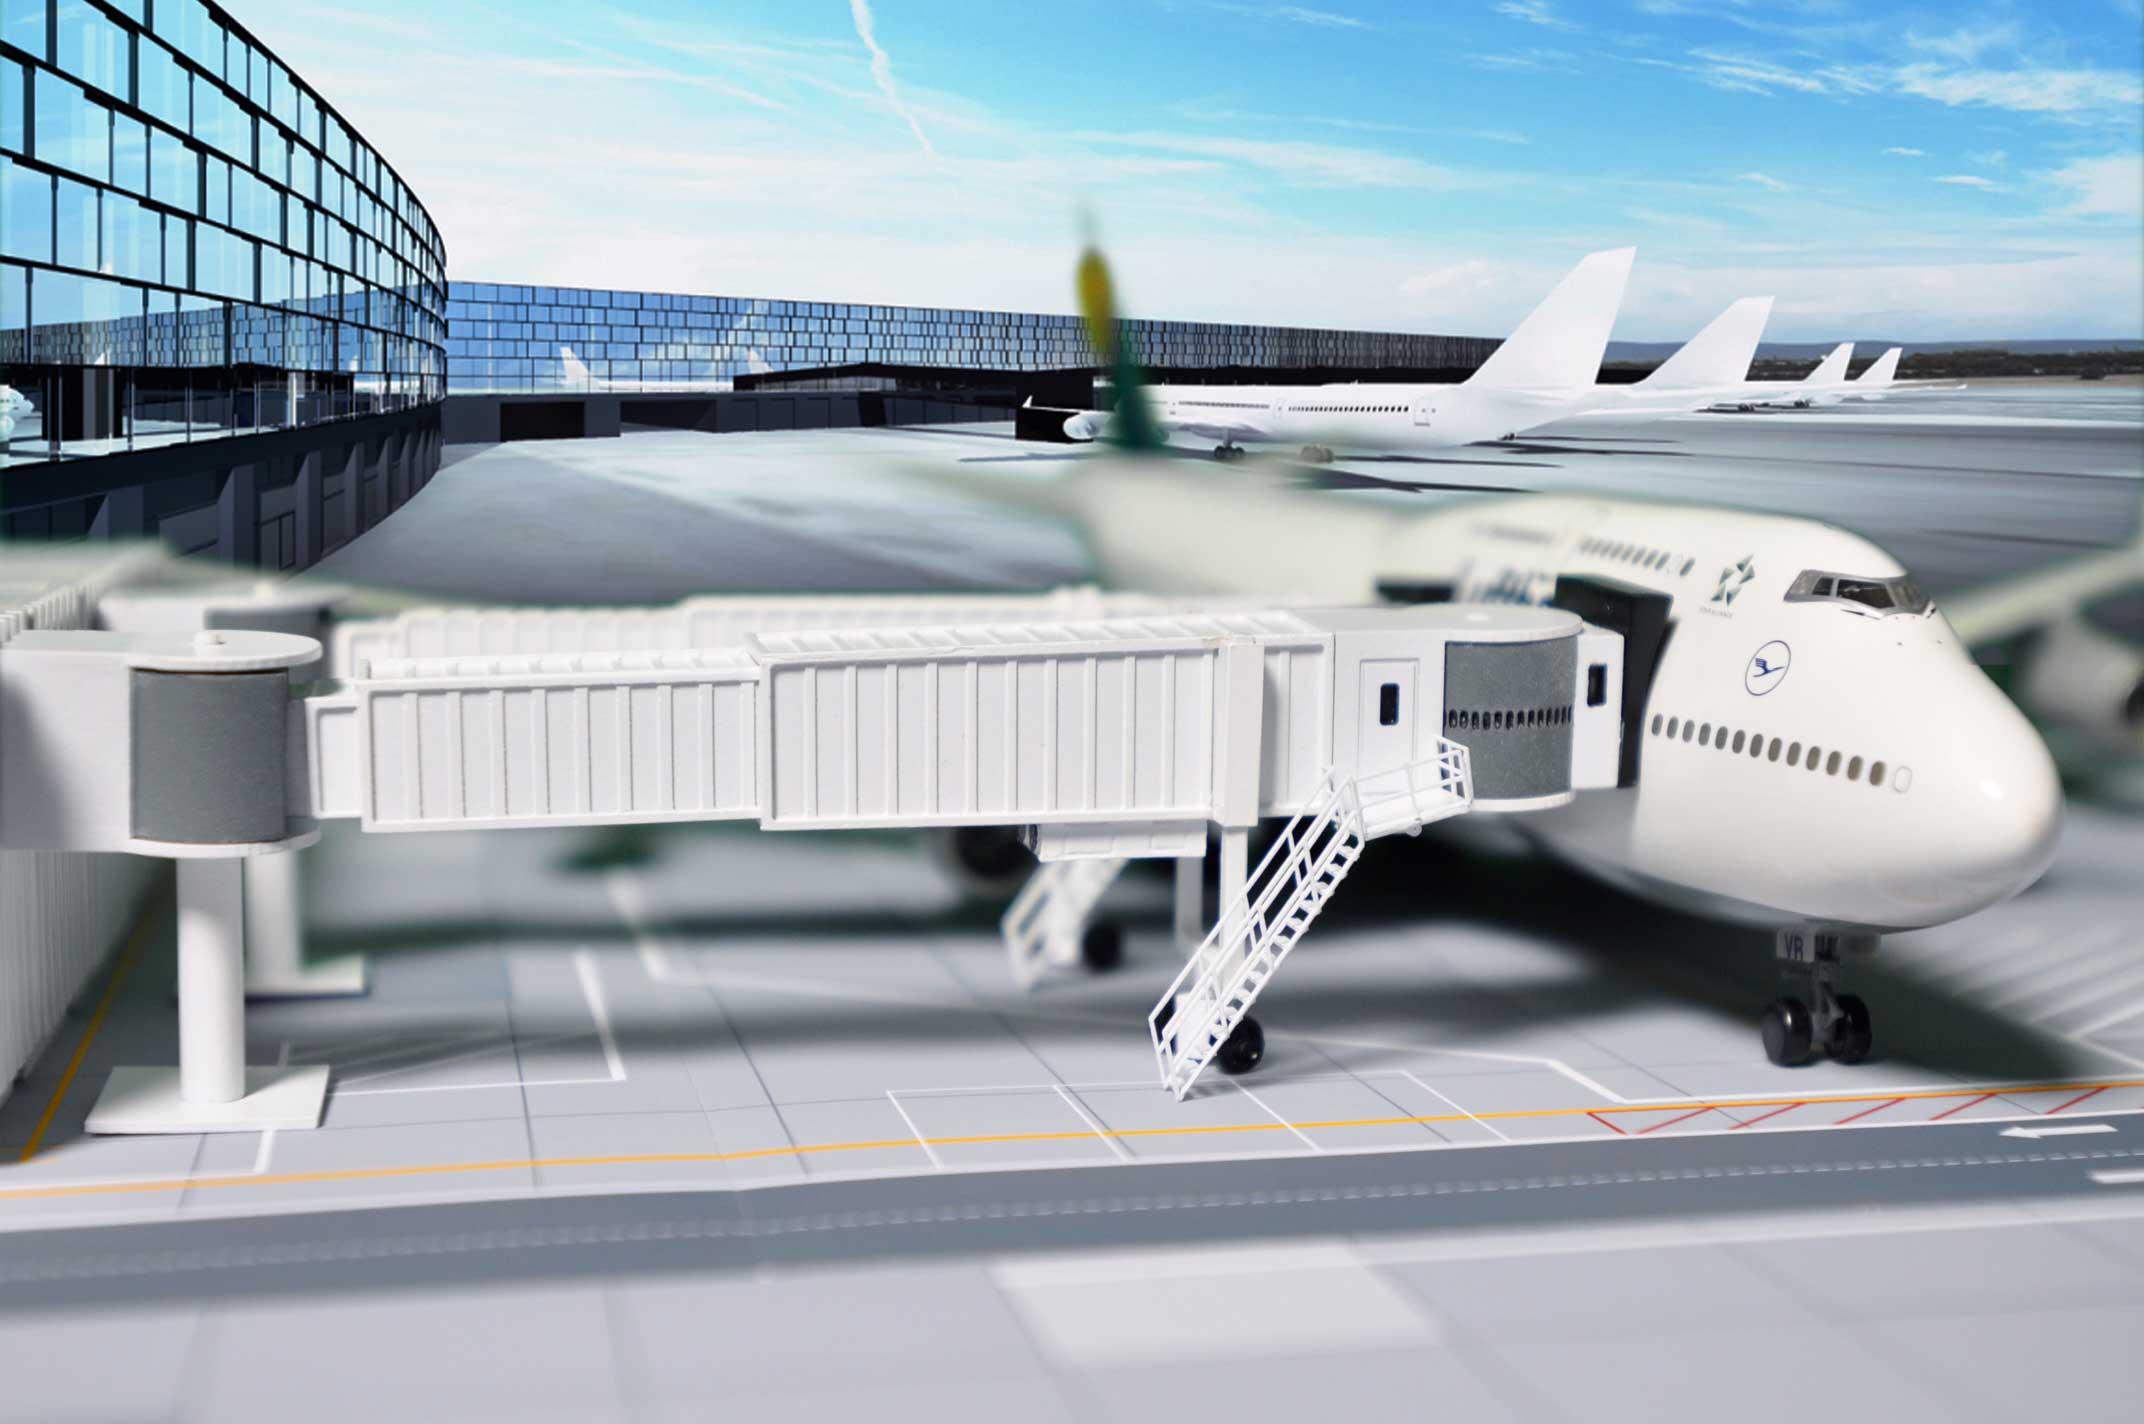 Fluggastbrücke als Flughafenzubehör für Modellflugzeuge